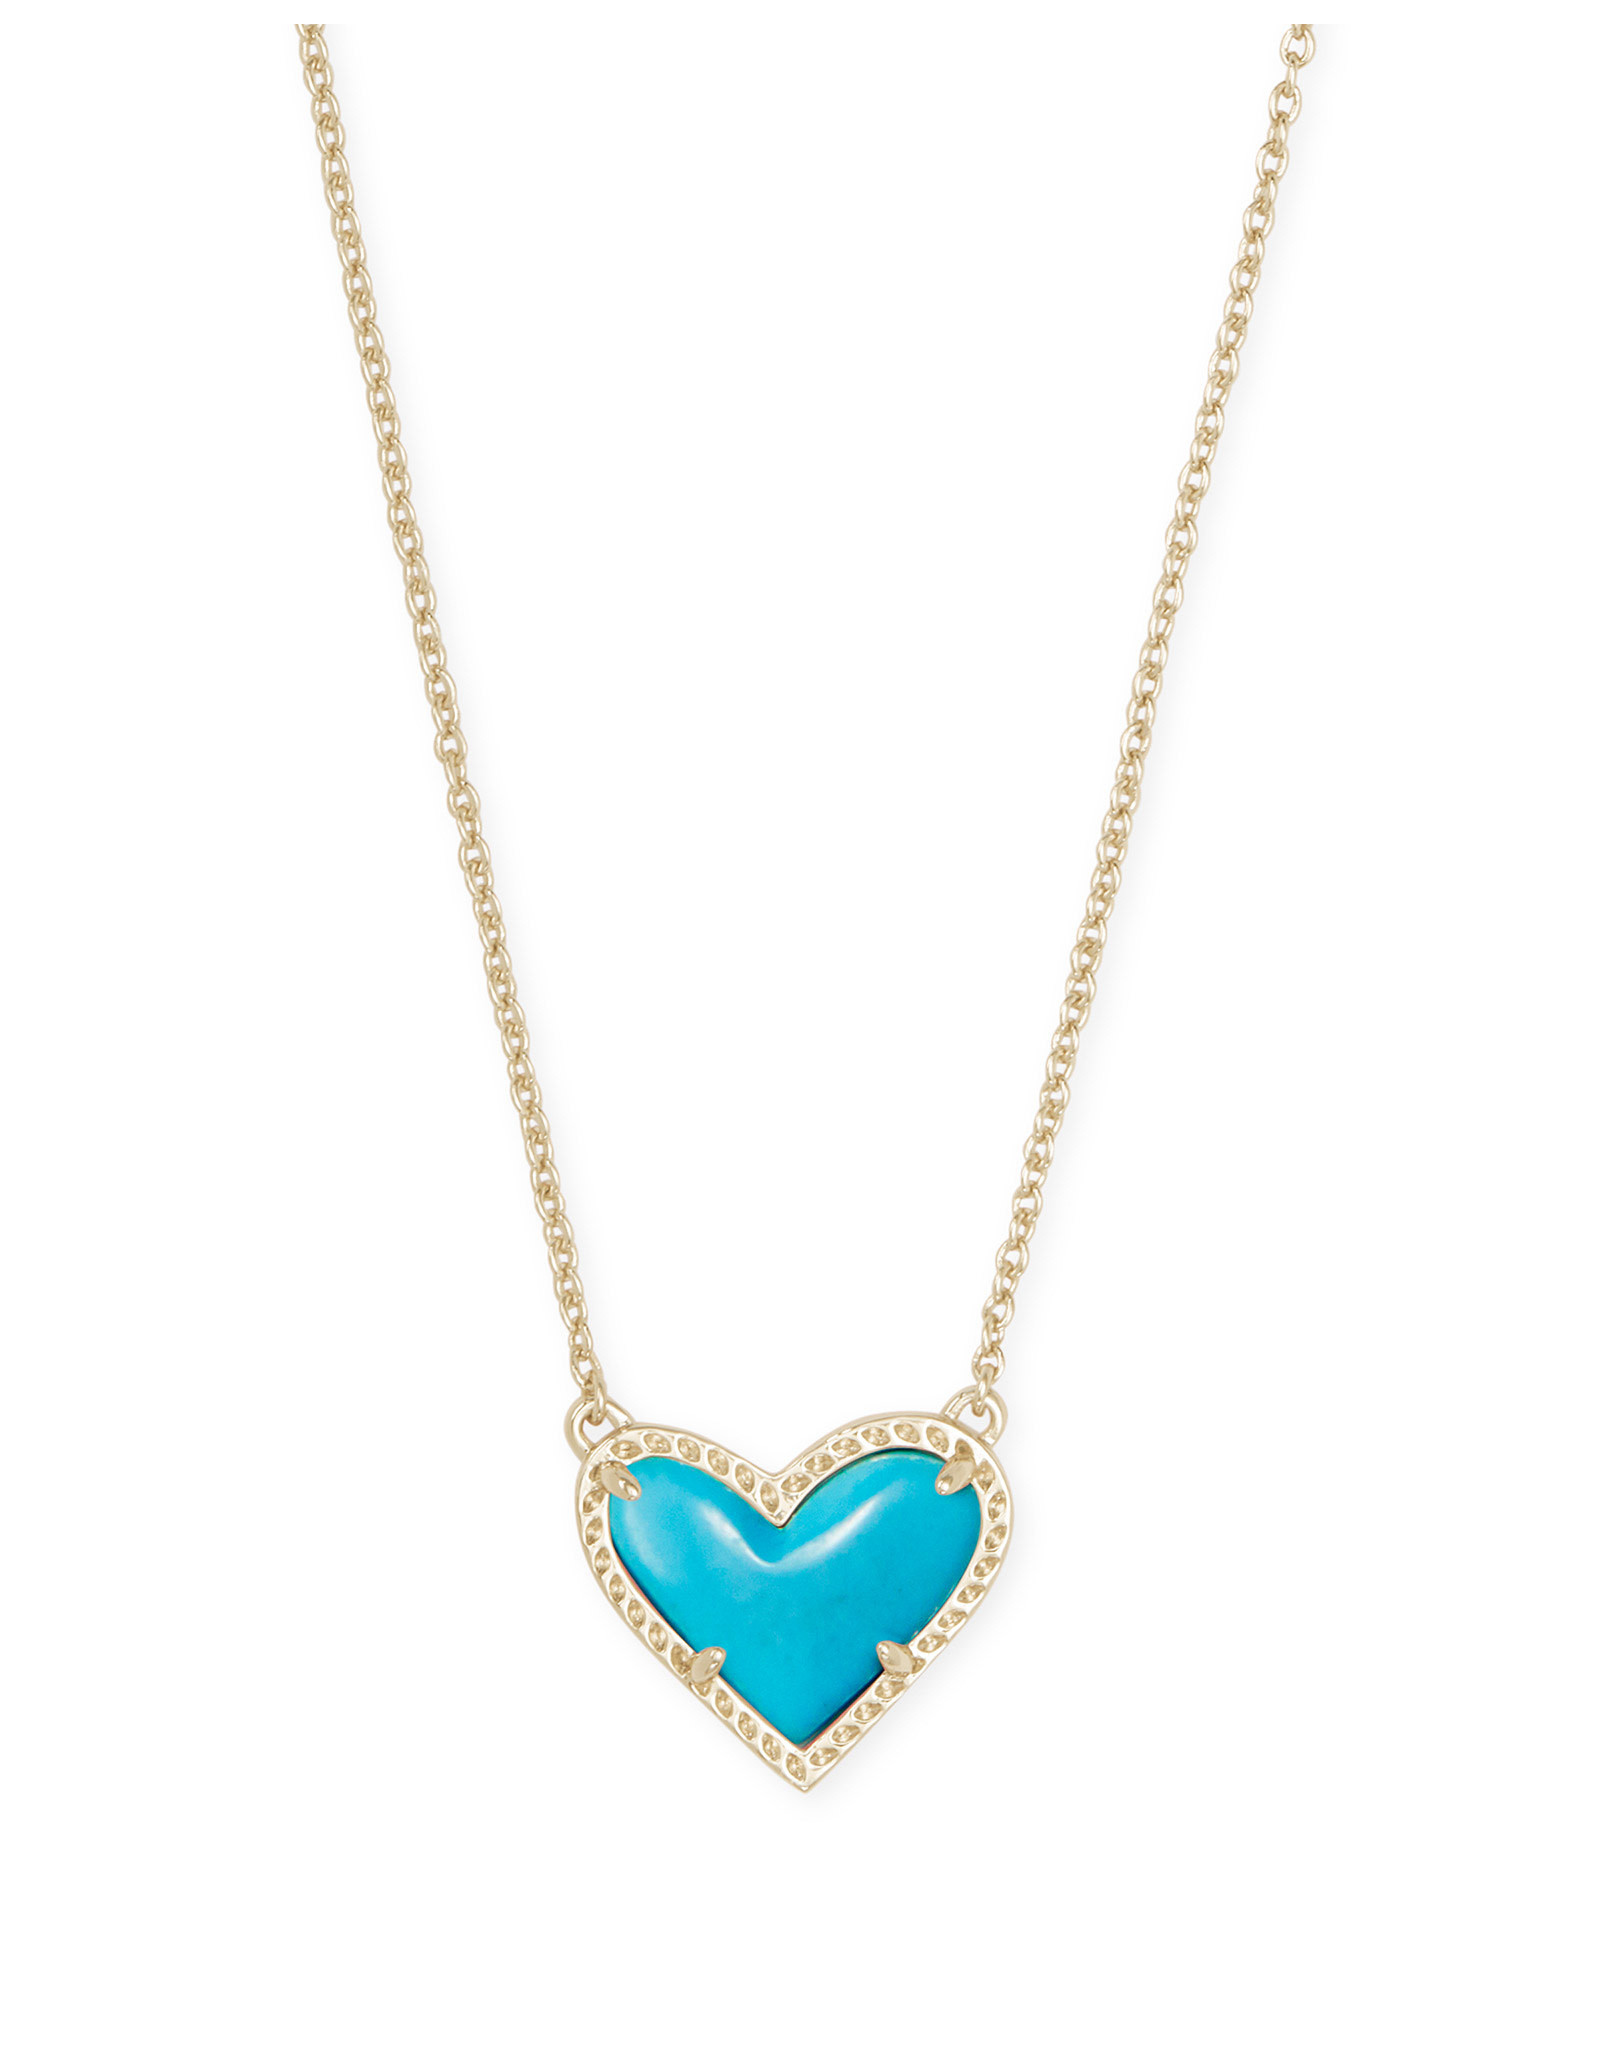 Kendra Scott Ari Heart Necklace